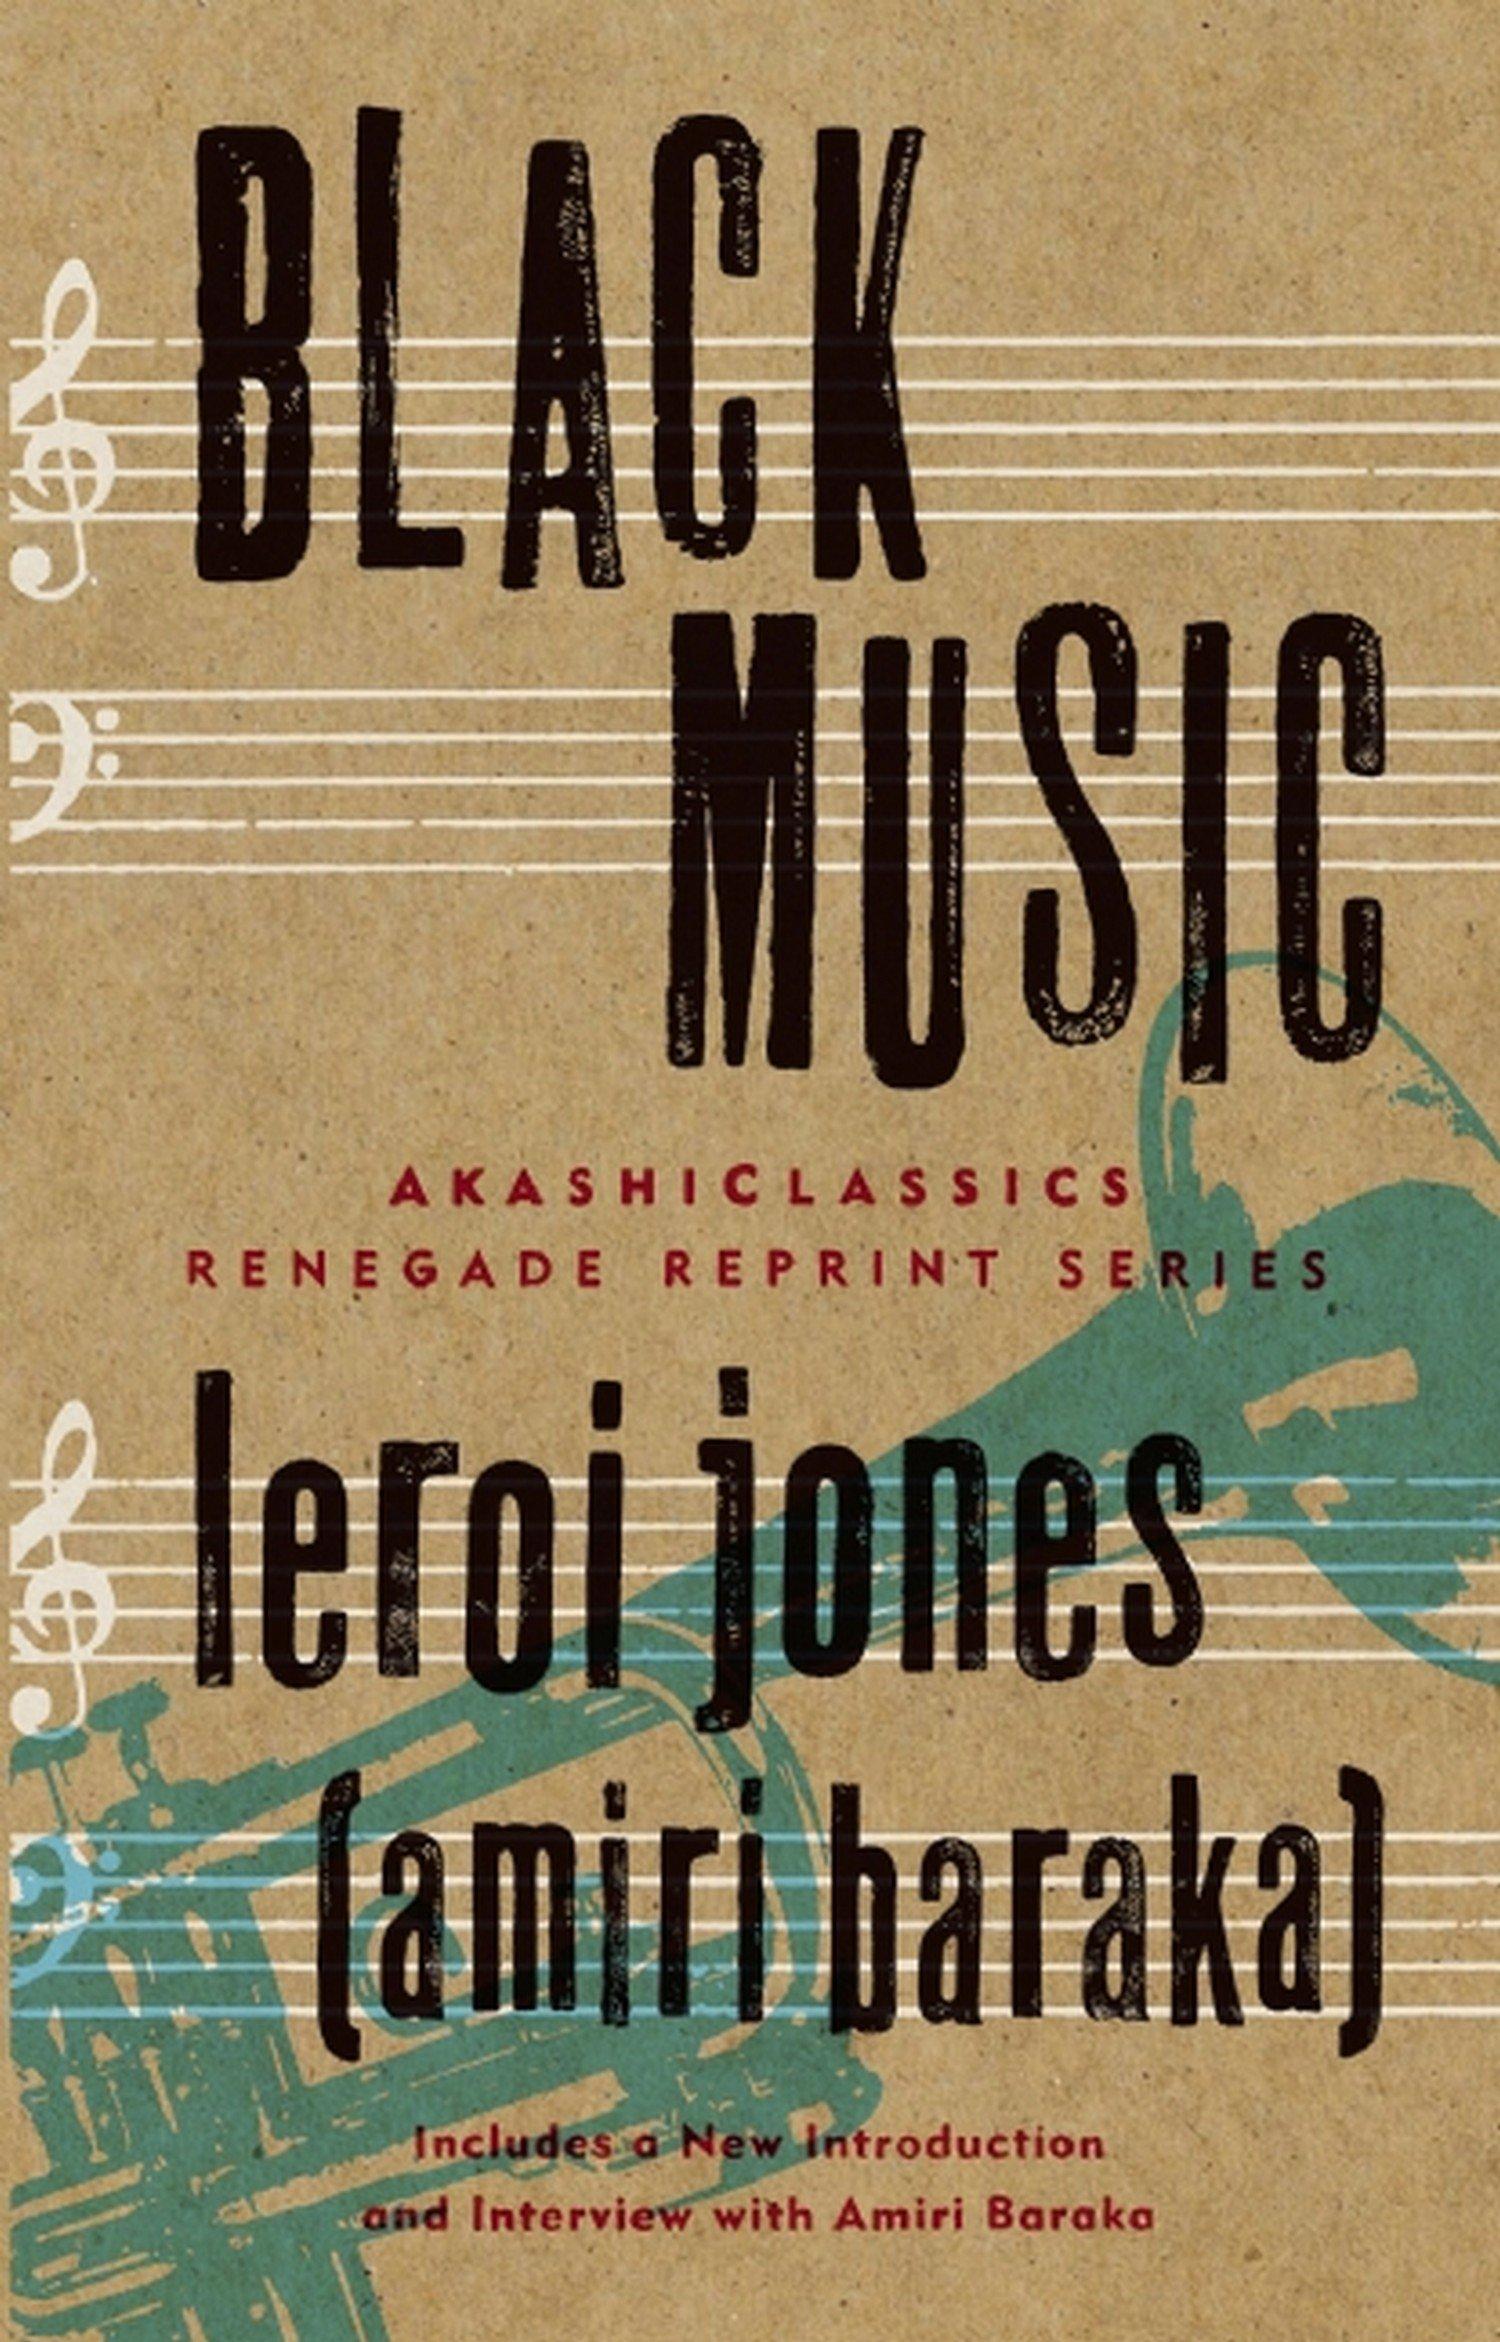 Black music Livre d'Amiri Baraka